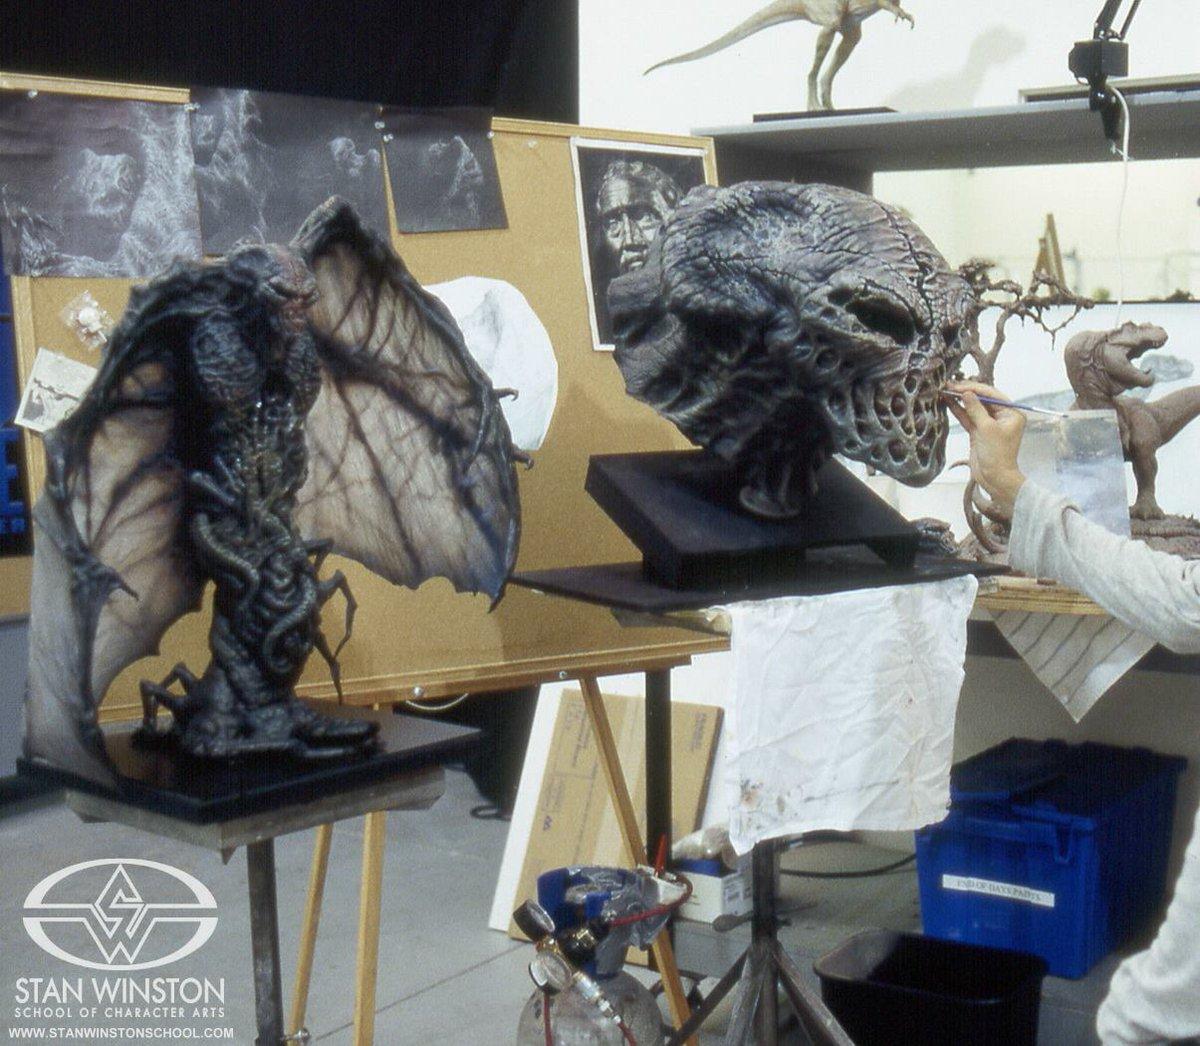 "Stan Winston School On Twitter: ""Demonic Creatures! The"